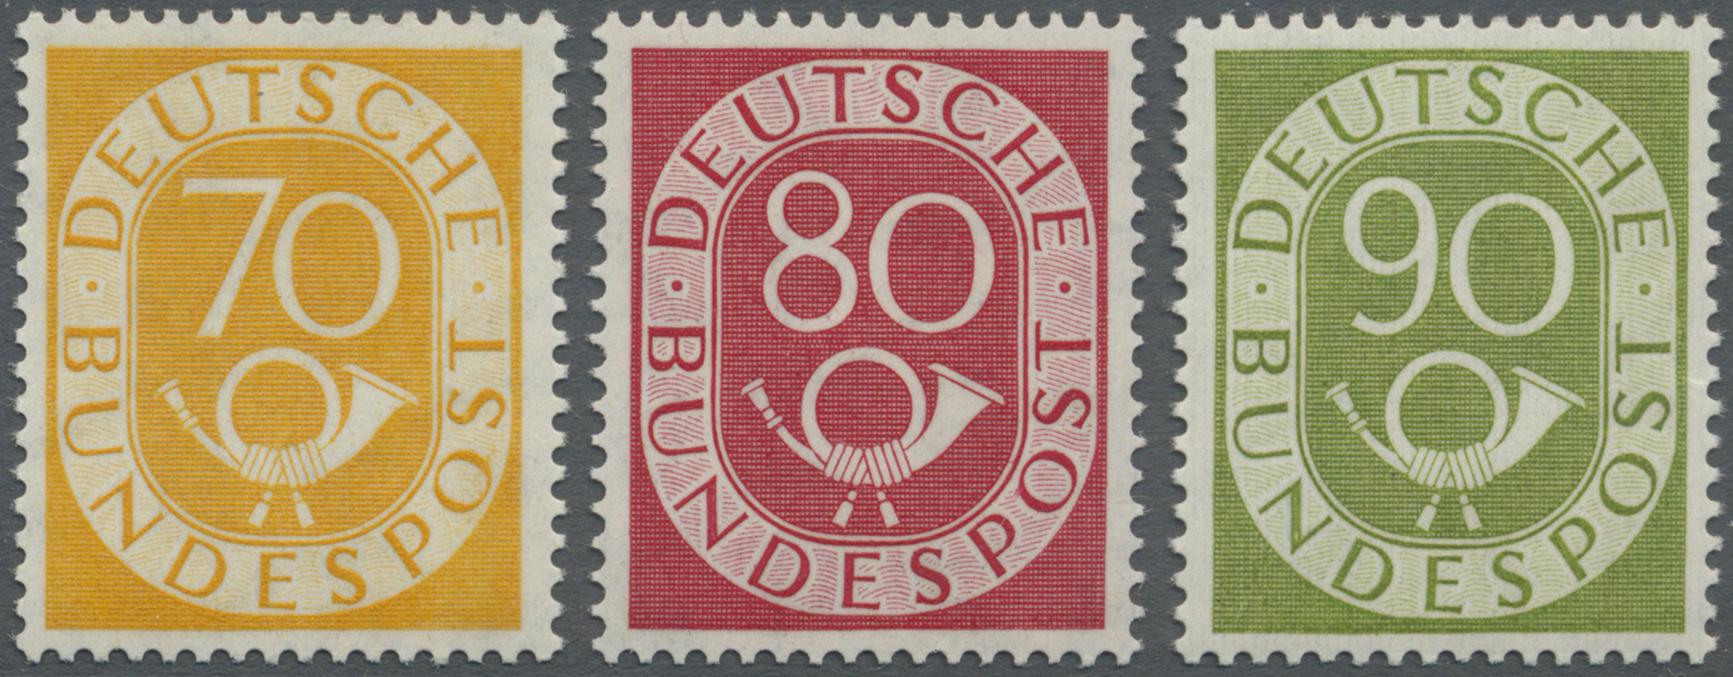 Lot 38374 - bundesrepublik deutschland  -  Auktionshaus Christoph Gärtner GmbH & Co. KG Collections Germany,  Collections Supplement, Surprise boxes #39 Day 7